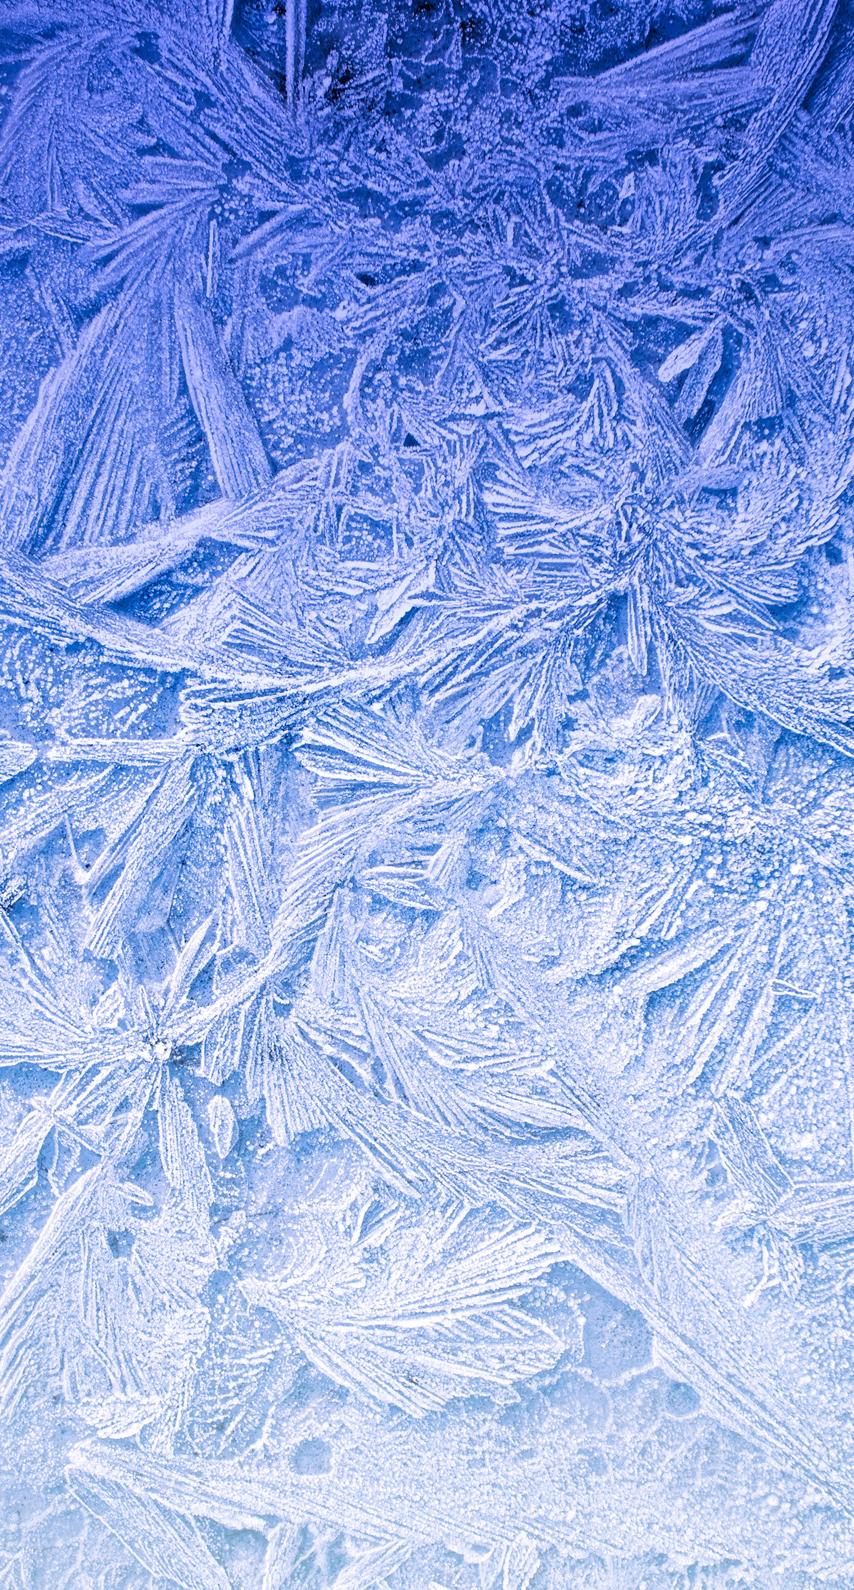 frost, design